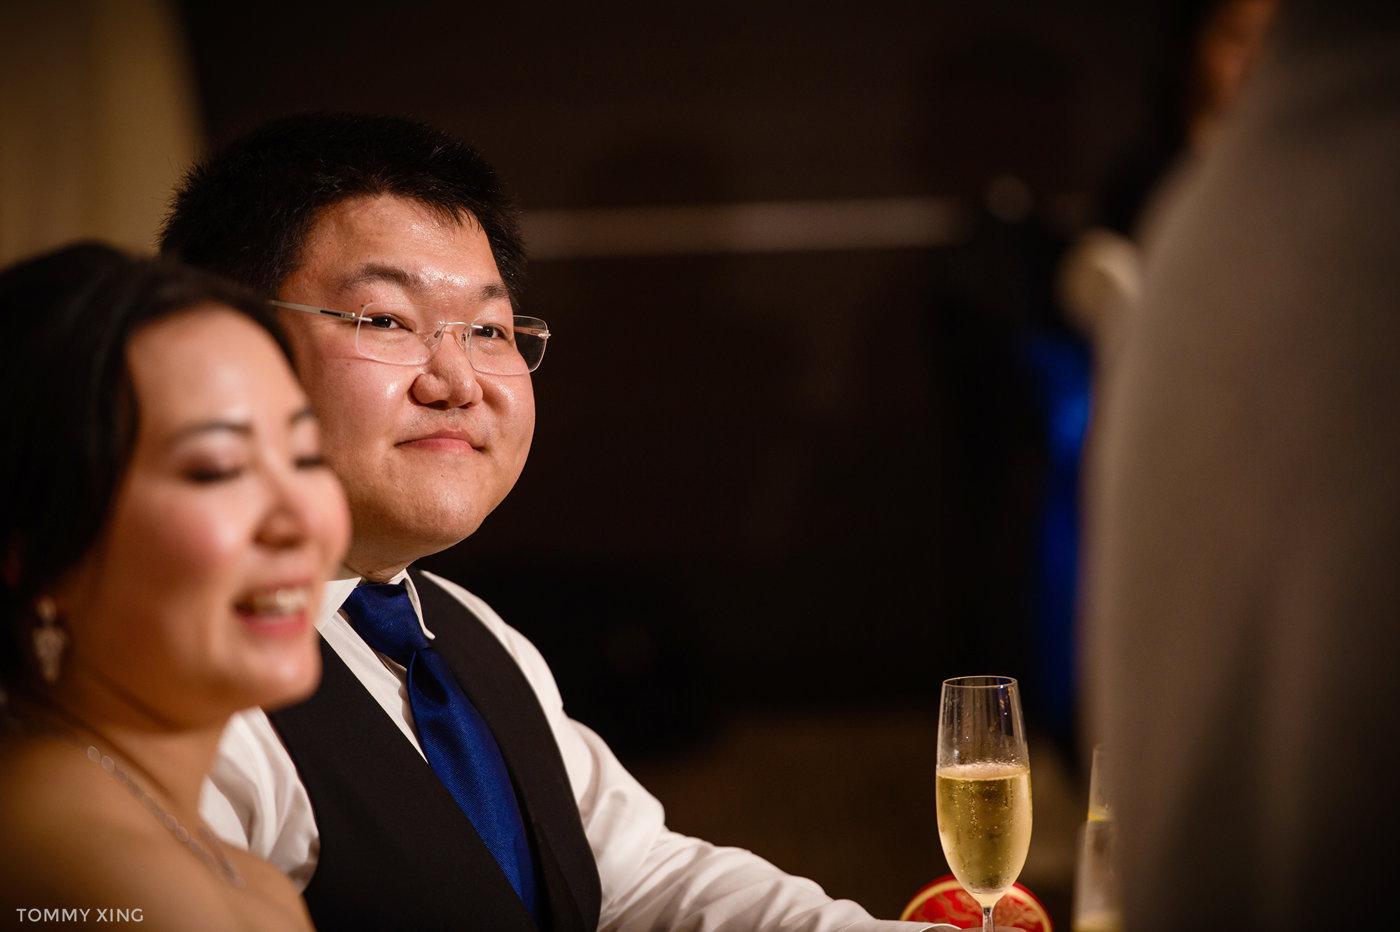 STANFORD MEMORIAL CHURCH WEDDING - Wenjie & Chengcheng - SAN FRANCISCO BAY AREA 斯坦福教堂婚礼跟拍 - 洛杉矶婚礼婚纱照摄影师 Tommy Xing Photography198.jpg